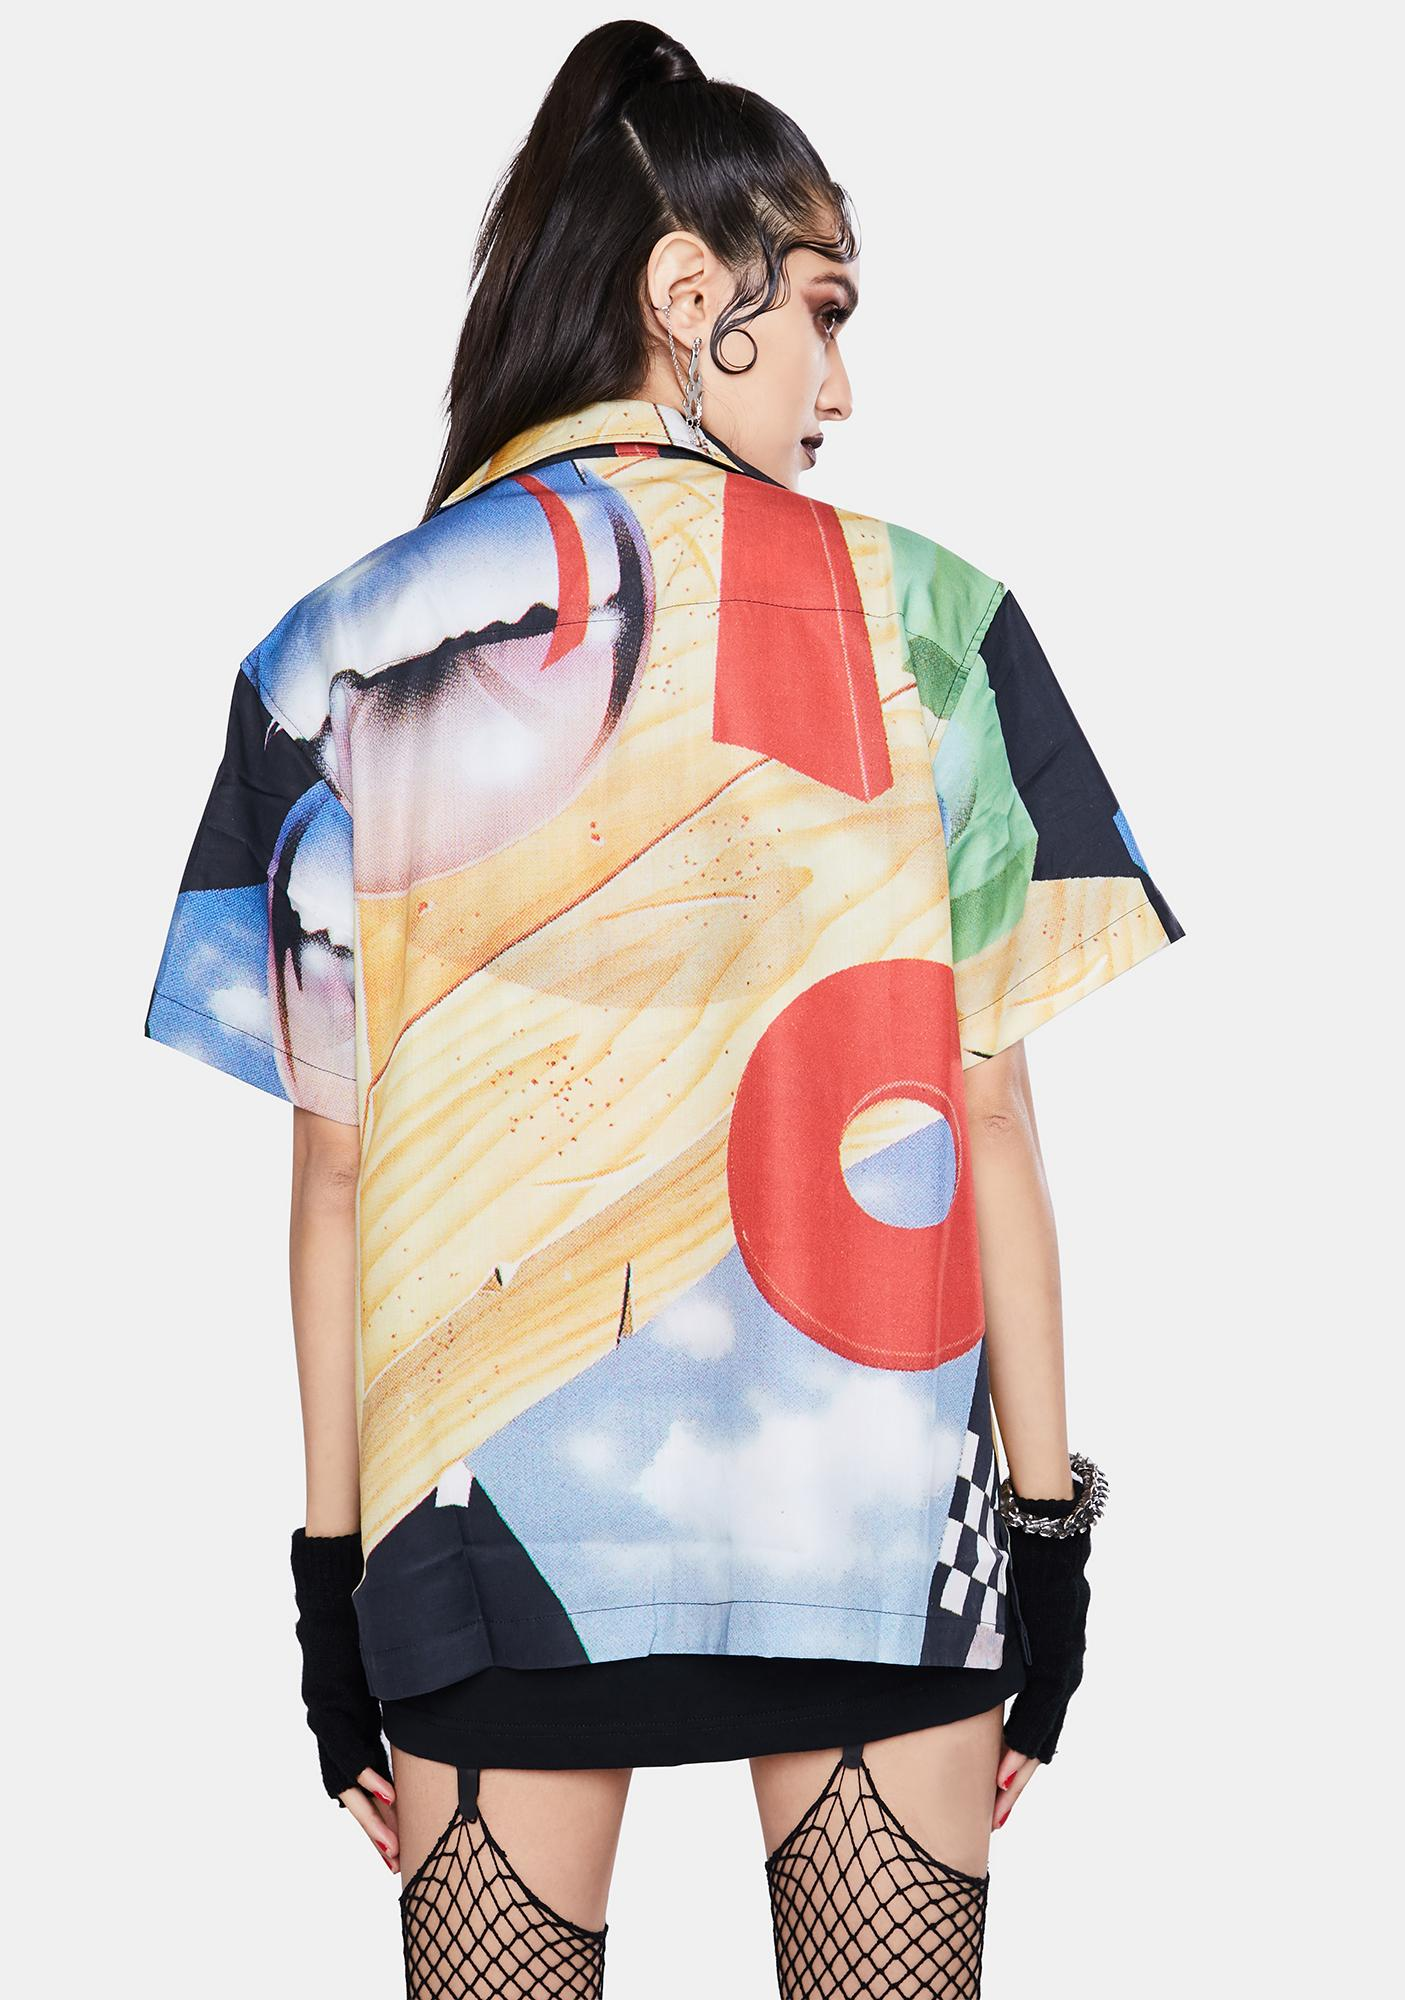 Deva States Favors Souvenir Shirt